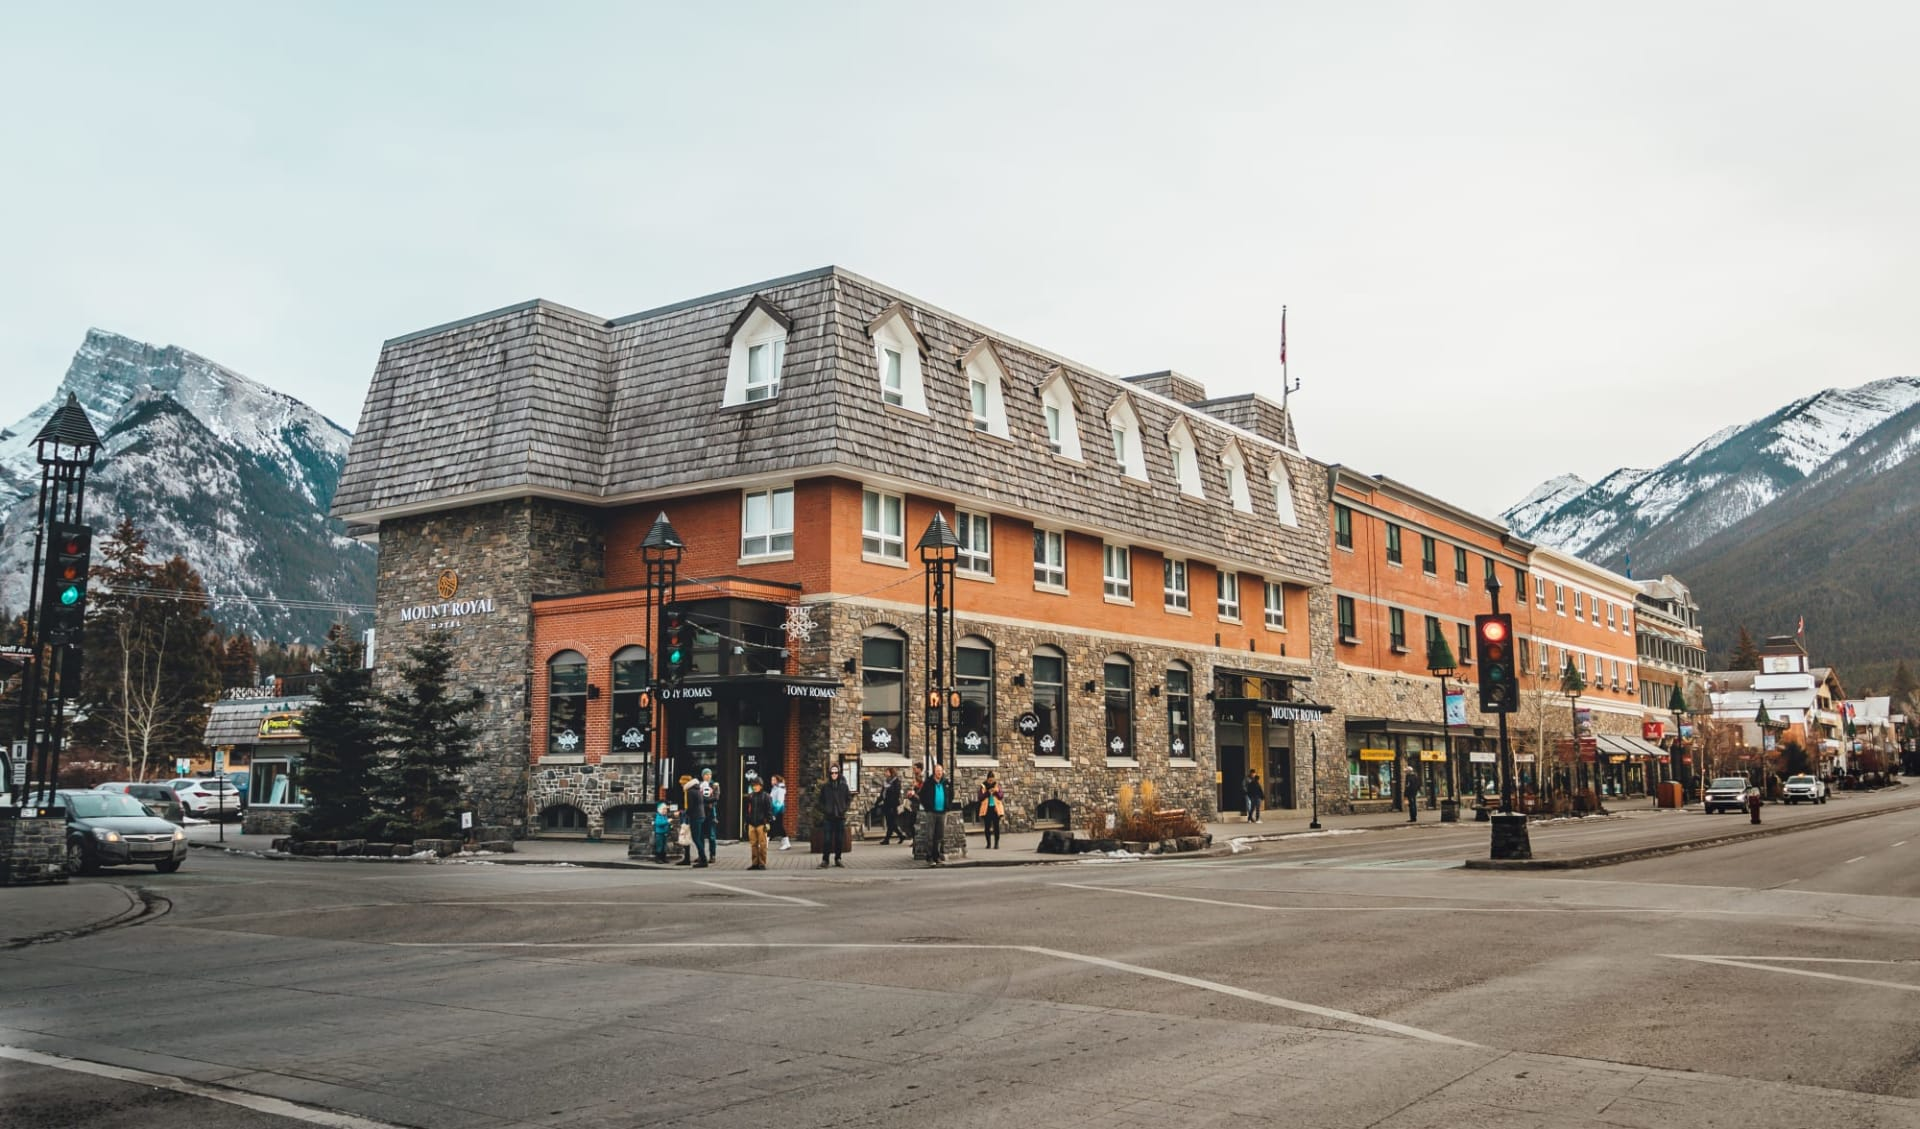 Mount Royal Hotel in Banff: Exterior_Banff Mount Royal Hotel_Aussenansicht 3_Jonview